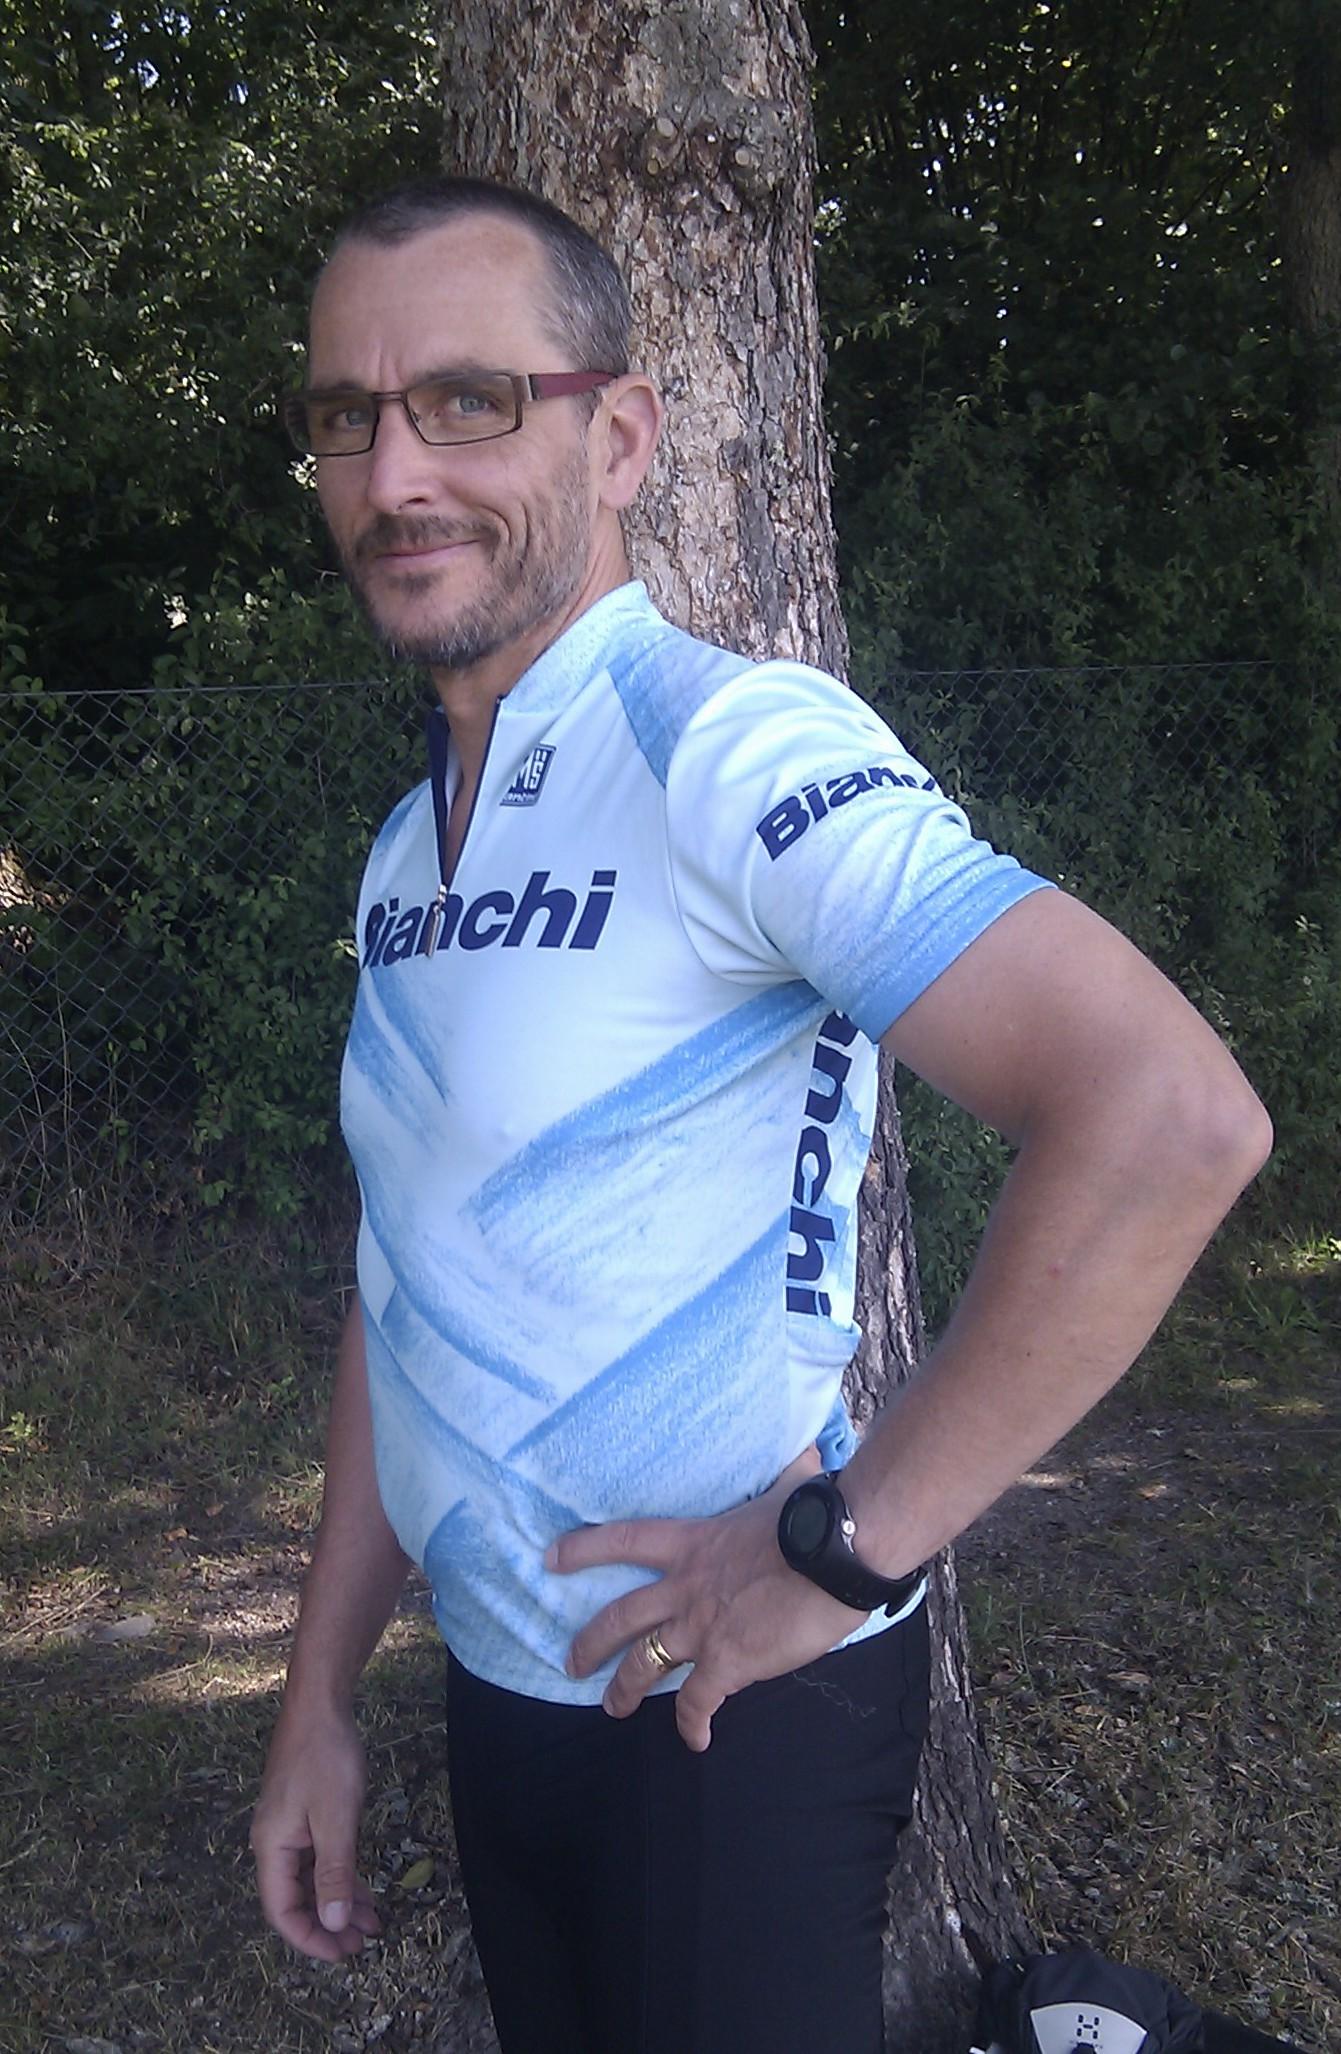 Johan_cykel